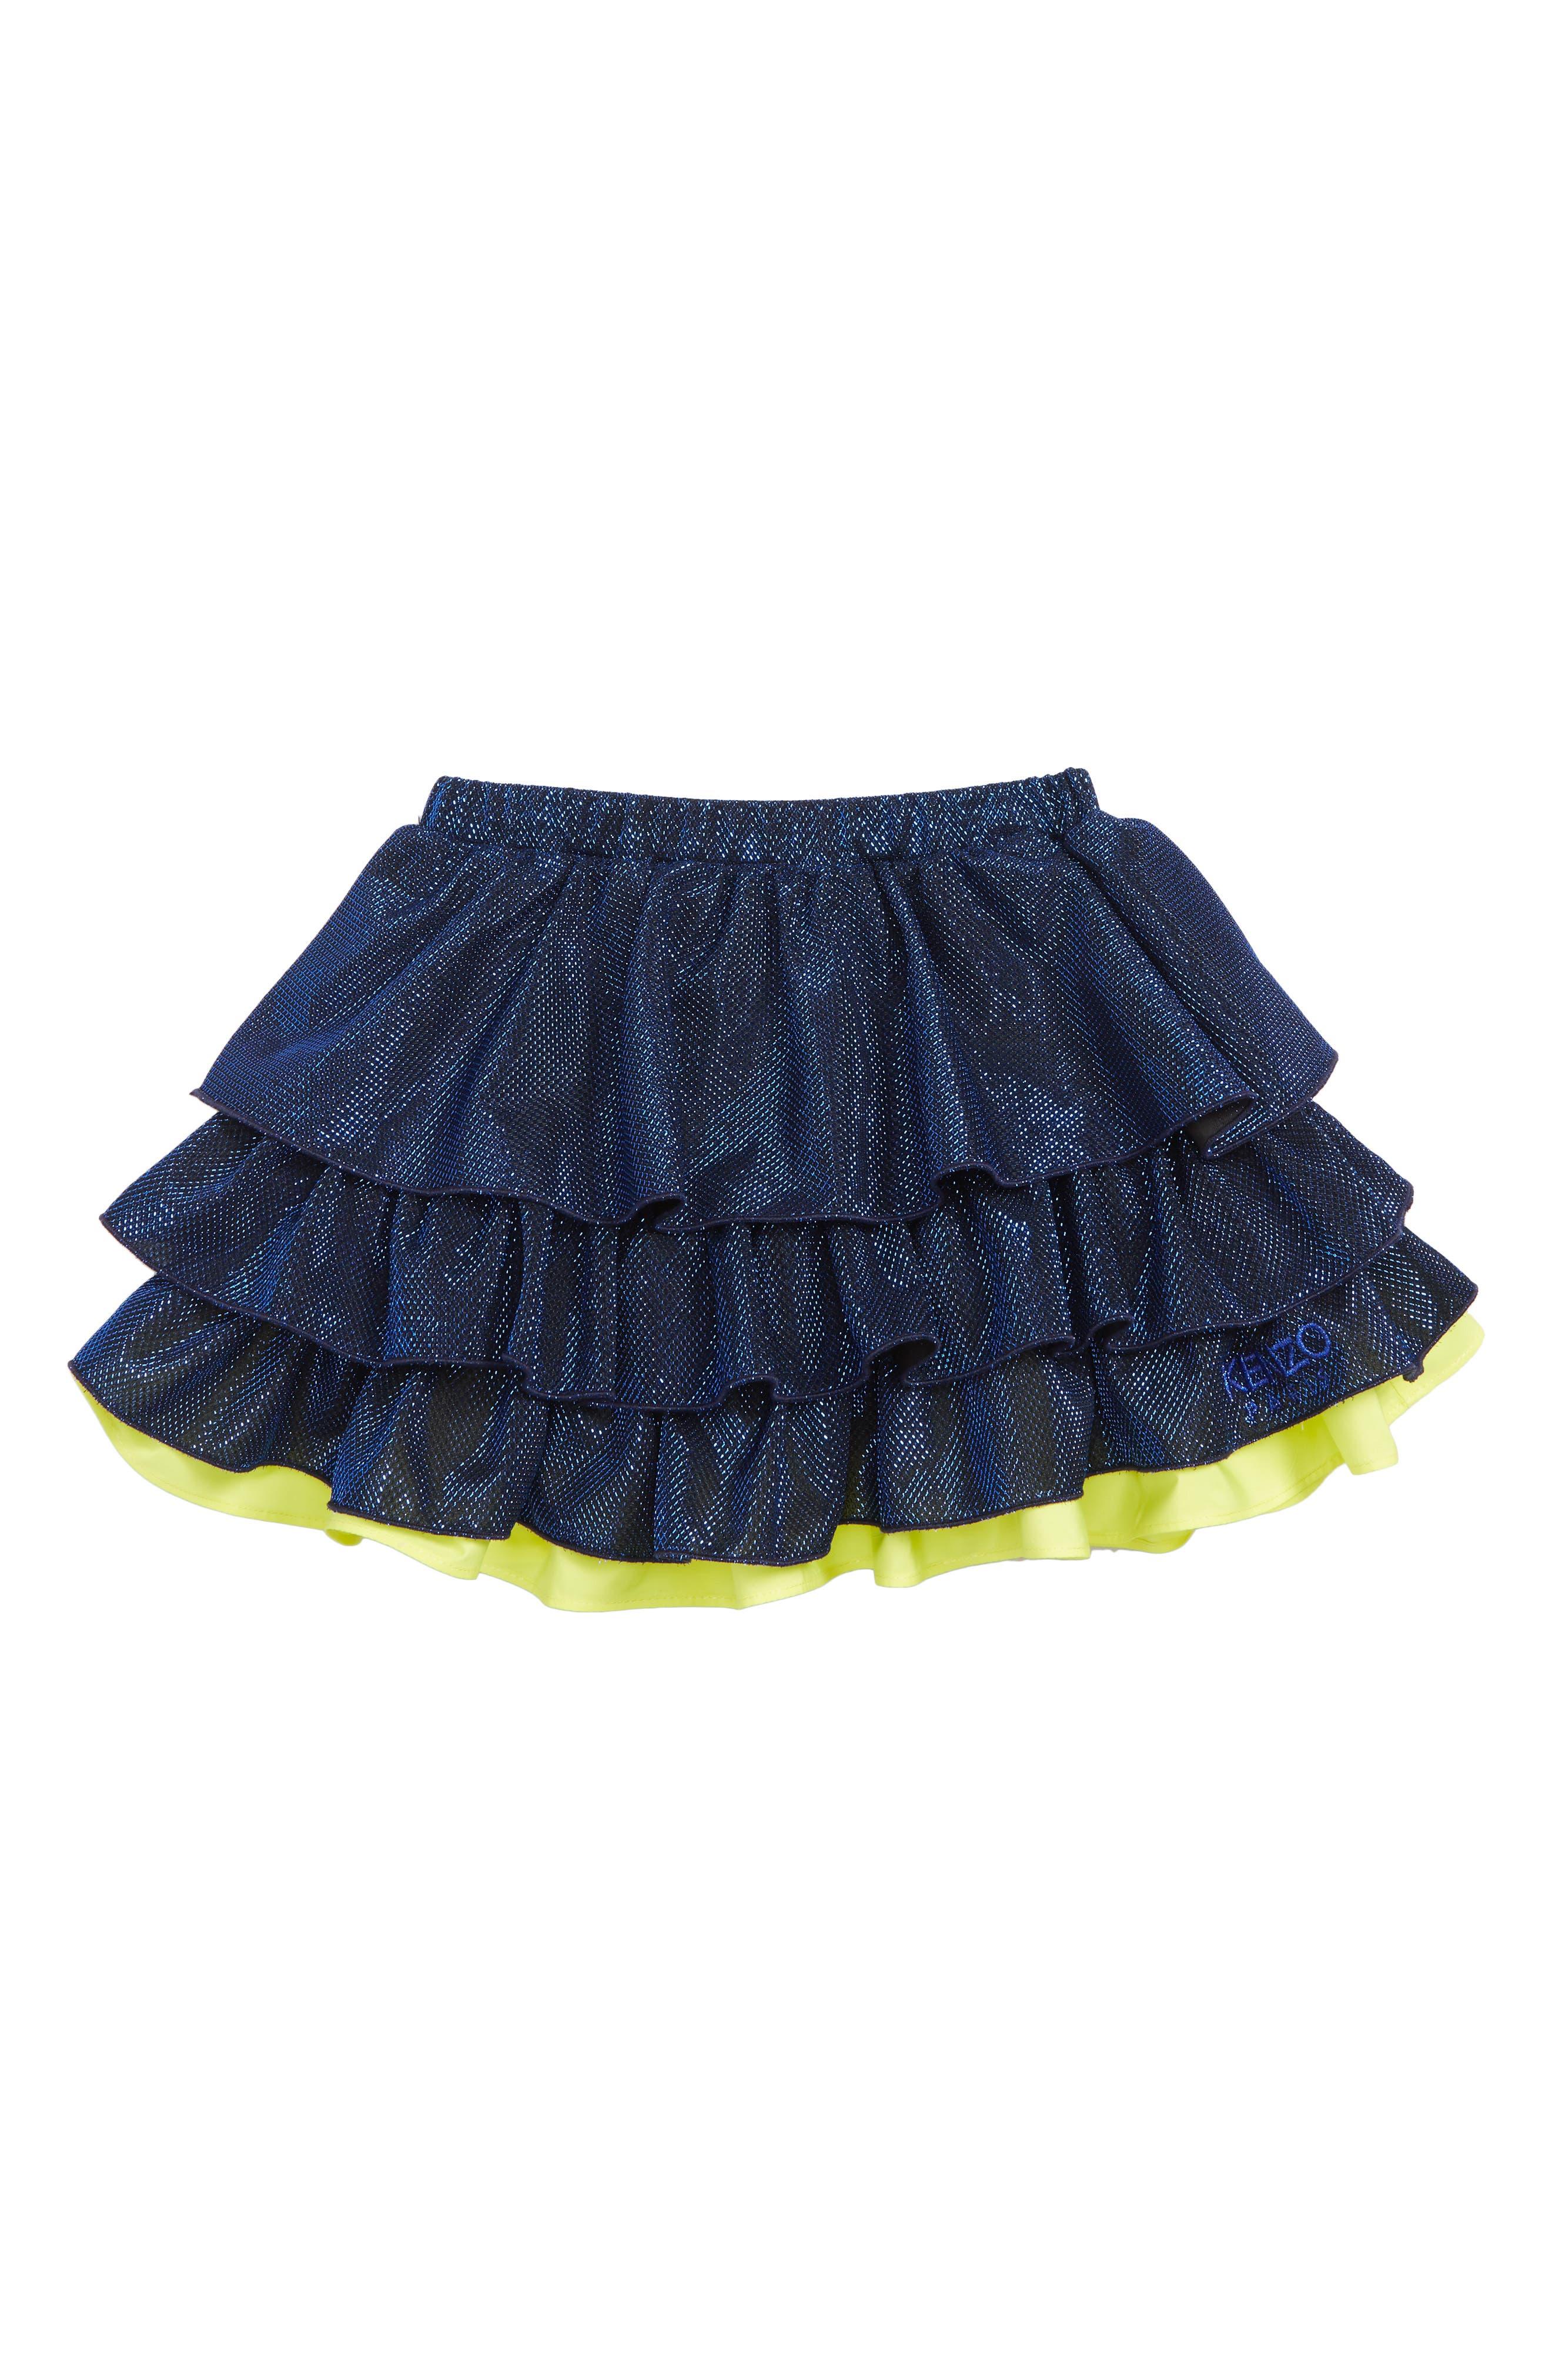 KENZO Metallic Party Skirt, Main, color, COBALT